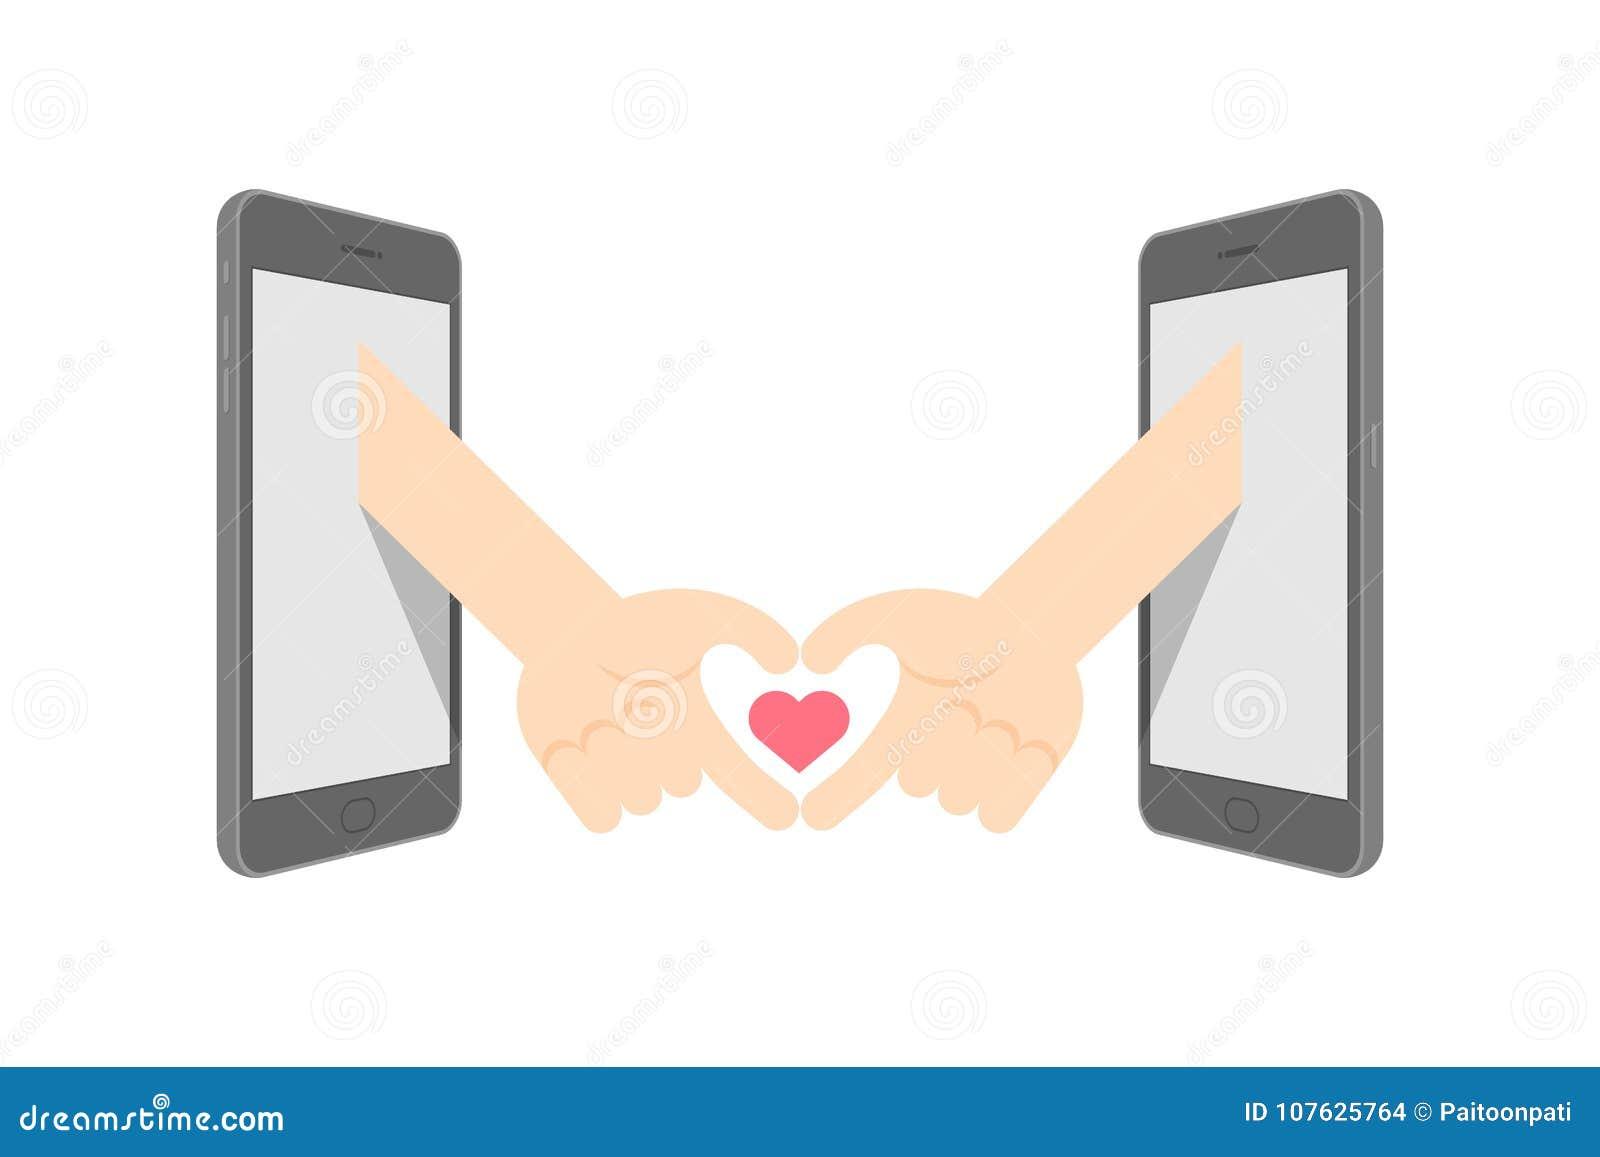 Hand Sign Language Heart Symbol Shape Between Two Smartphone Set